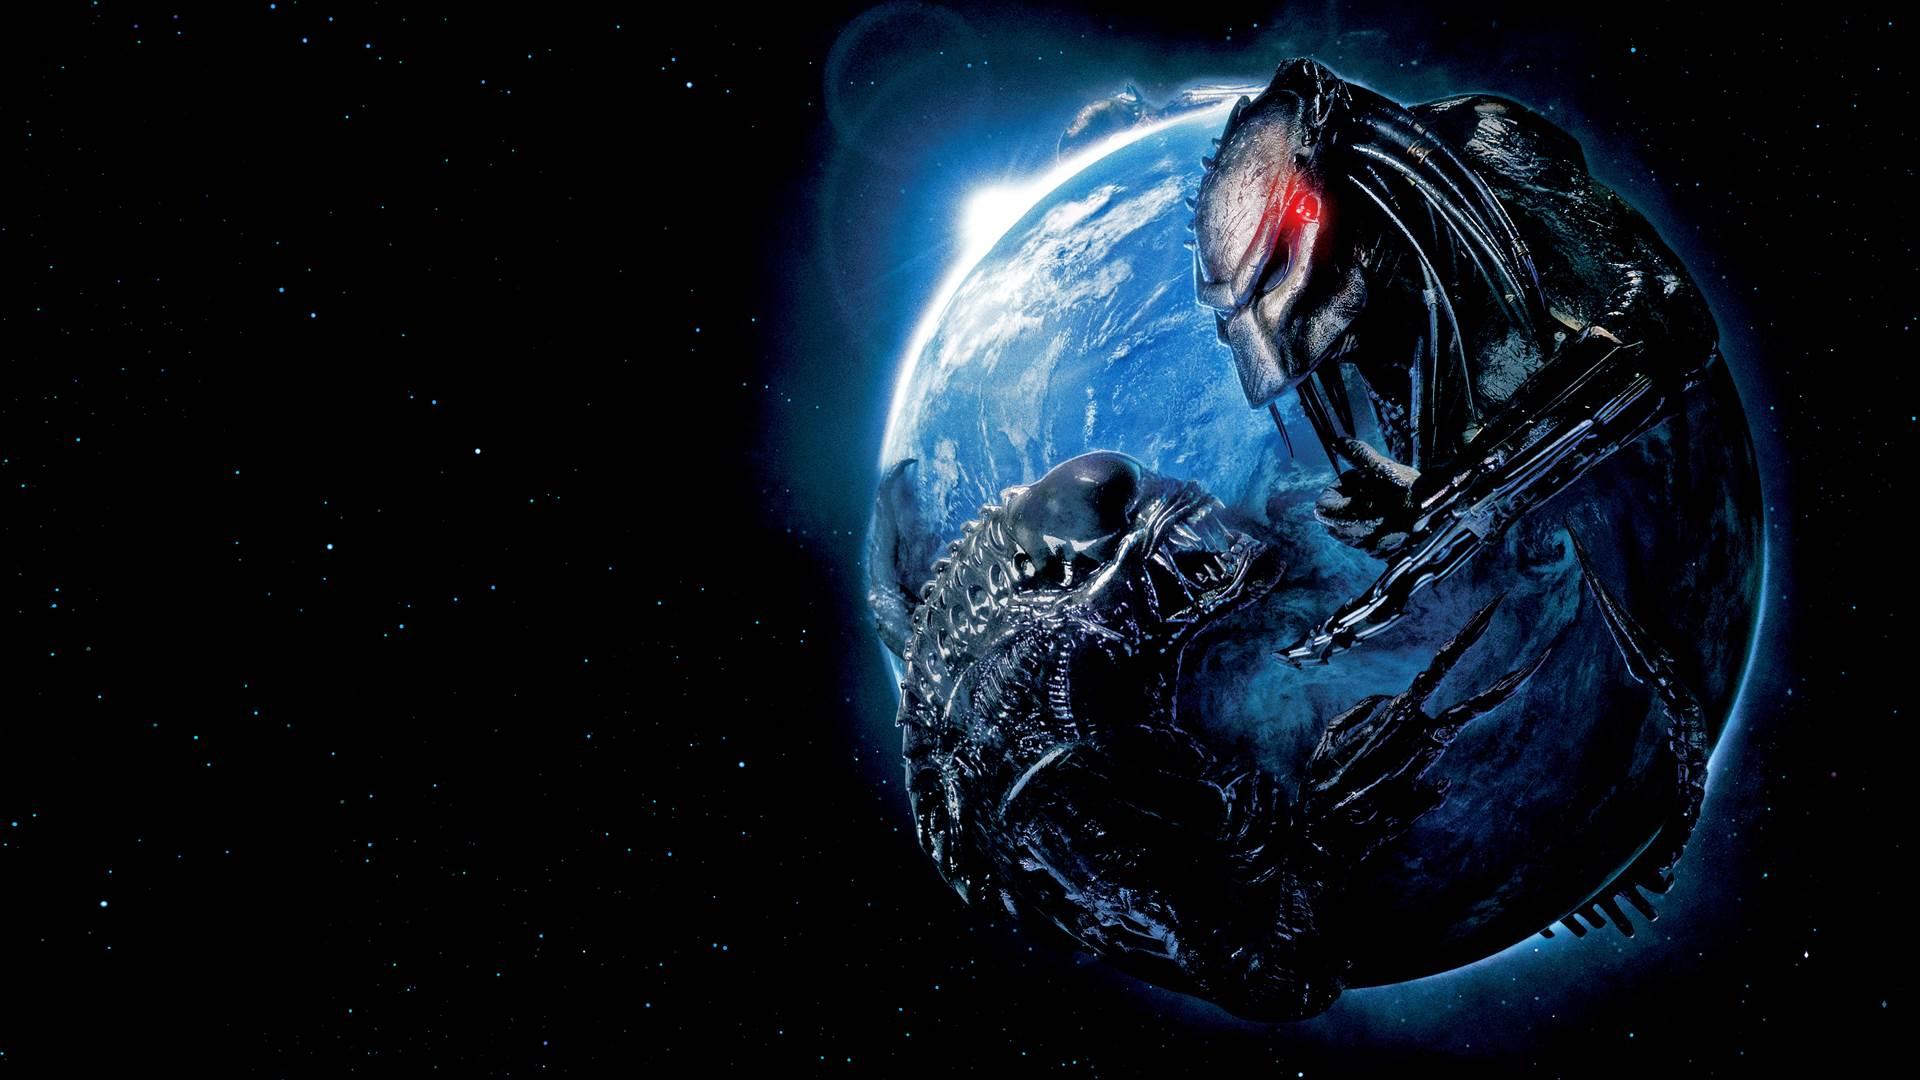 Alien Vs Predator Hd Wallpapers: Predator Vs. Alien Wallpapers (56 Wallpapers)